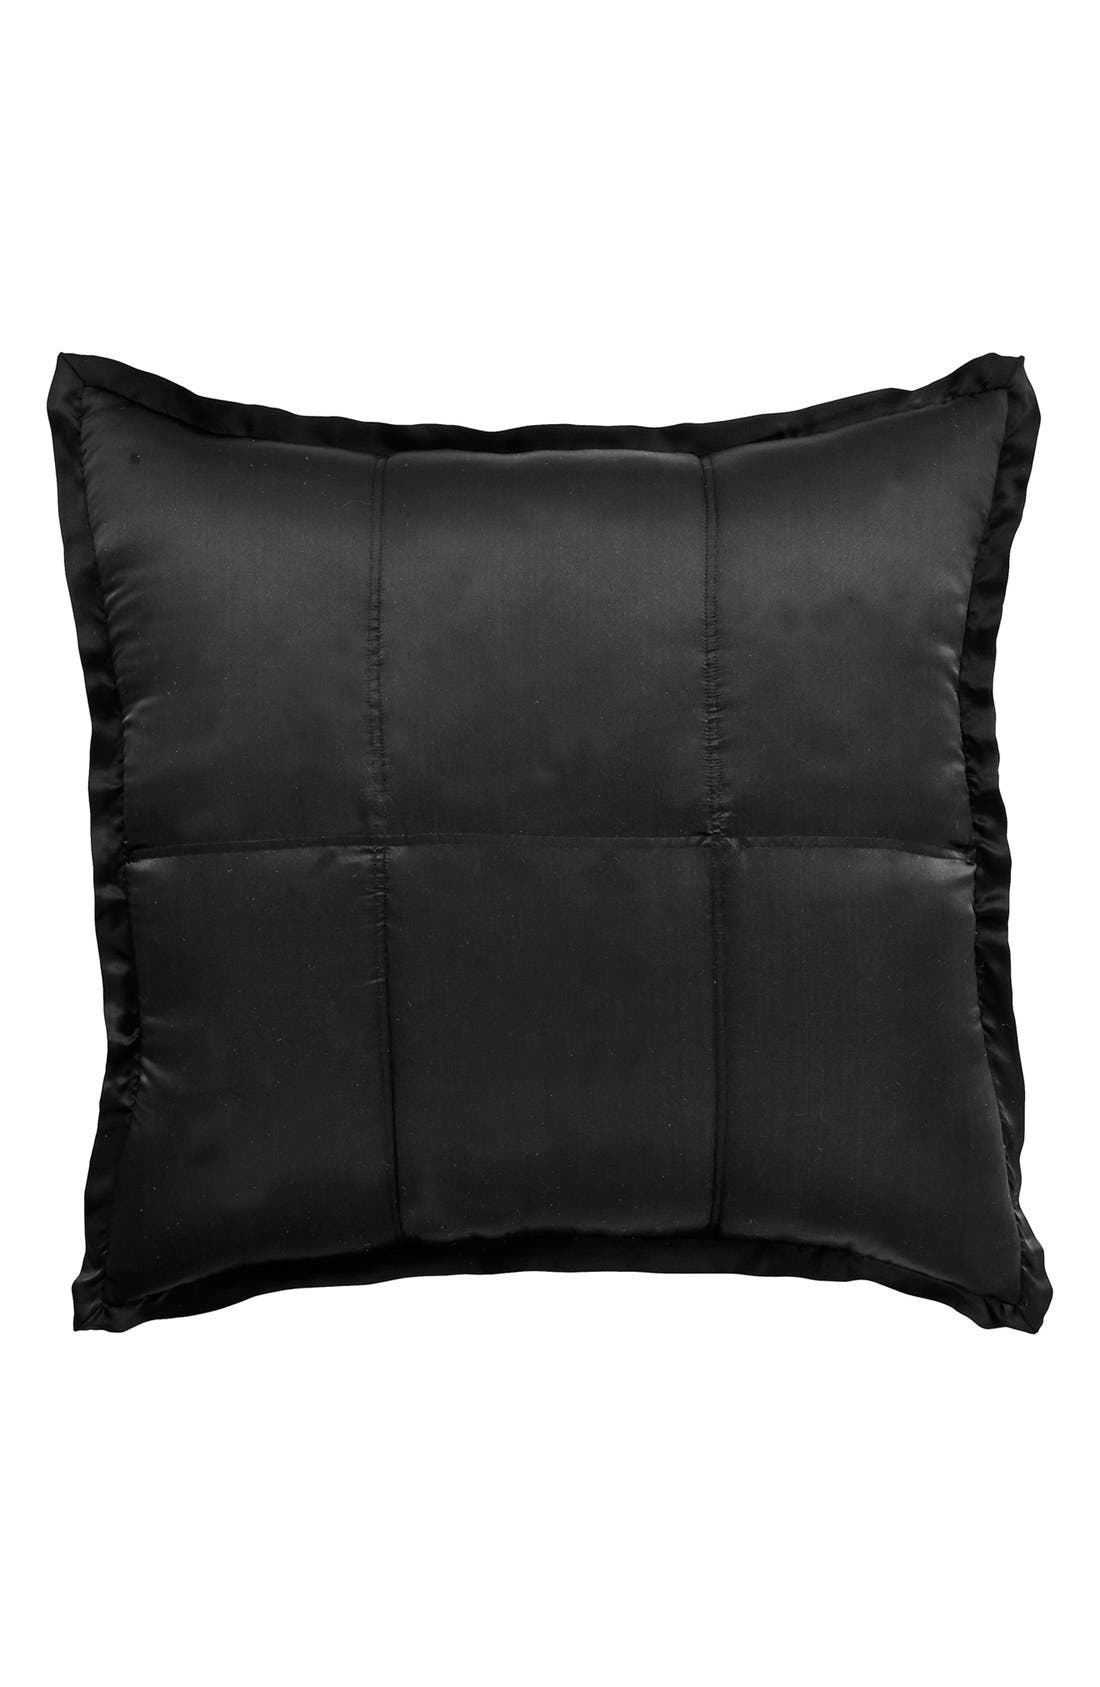 Donna Karan Collection 'Impression' Silk Euro Sham,                         Main,                         color, Ebony Black